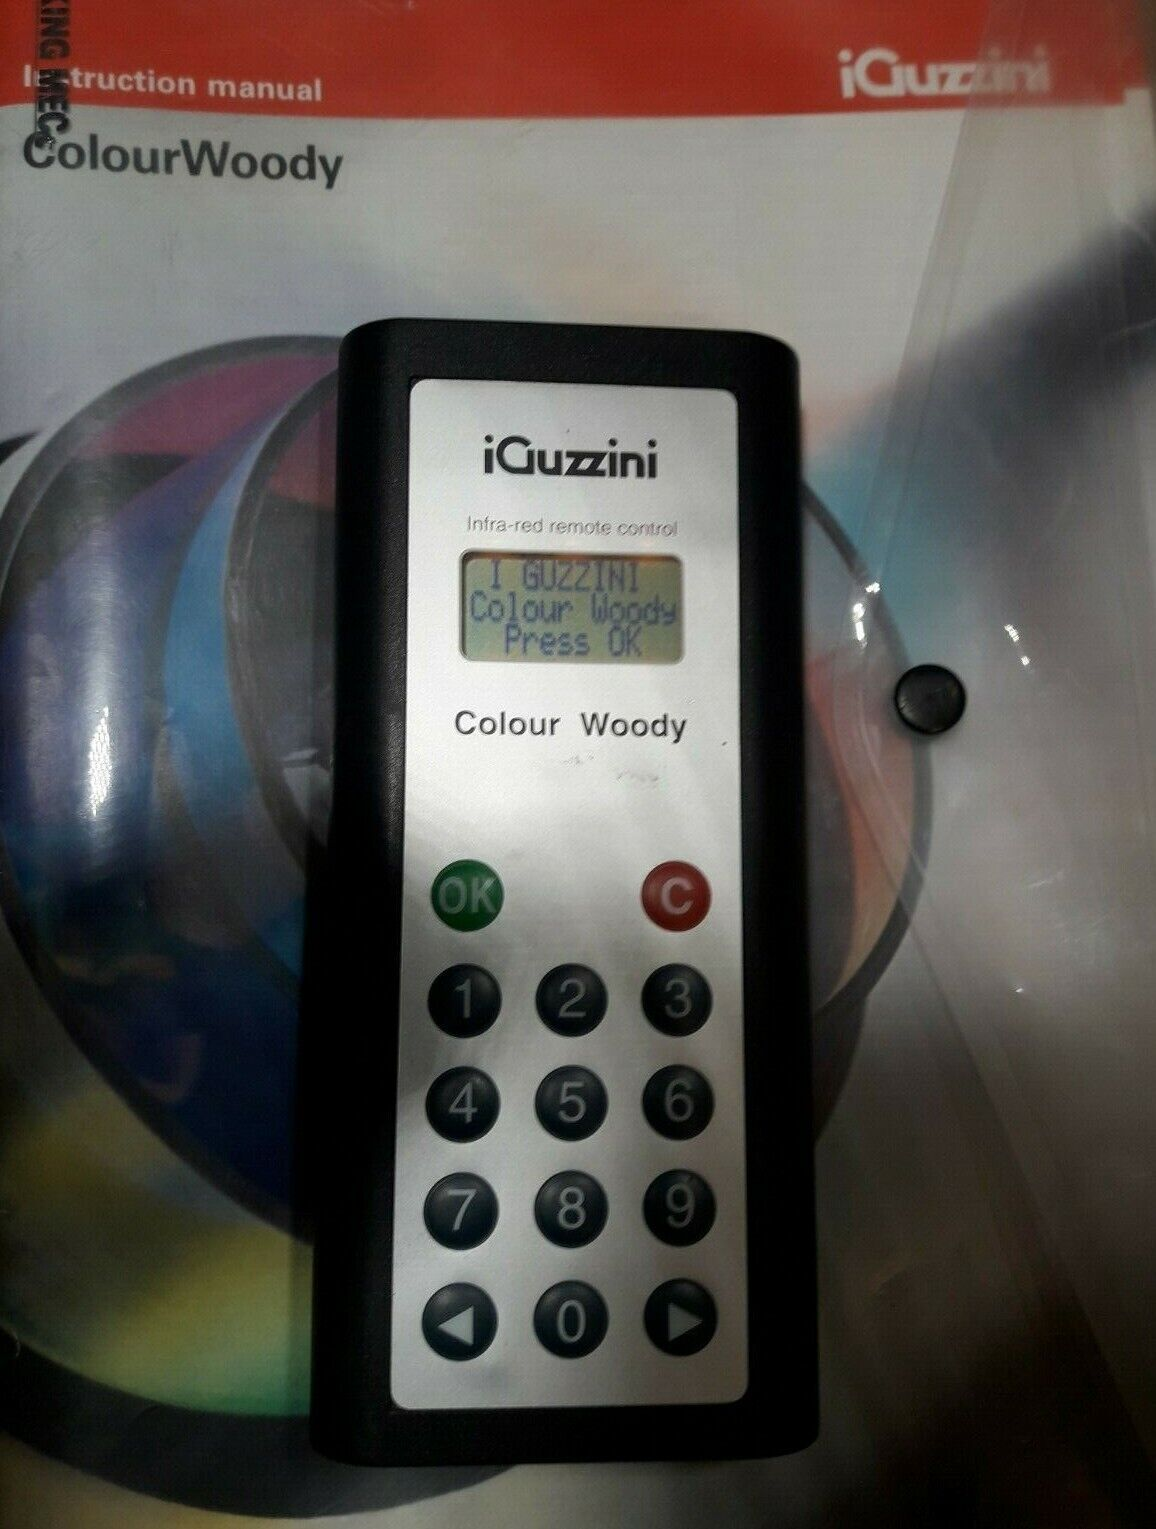 IGuzzini Colour Woody Remote Control Fernbedienung Steuerung Infrarot Infrarot